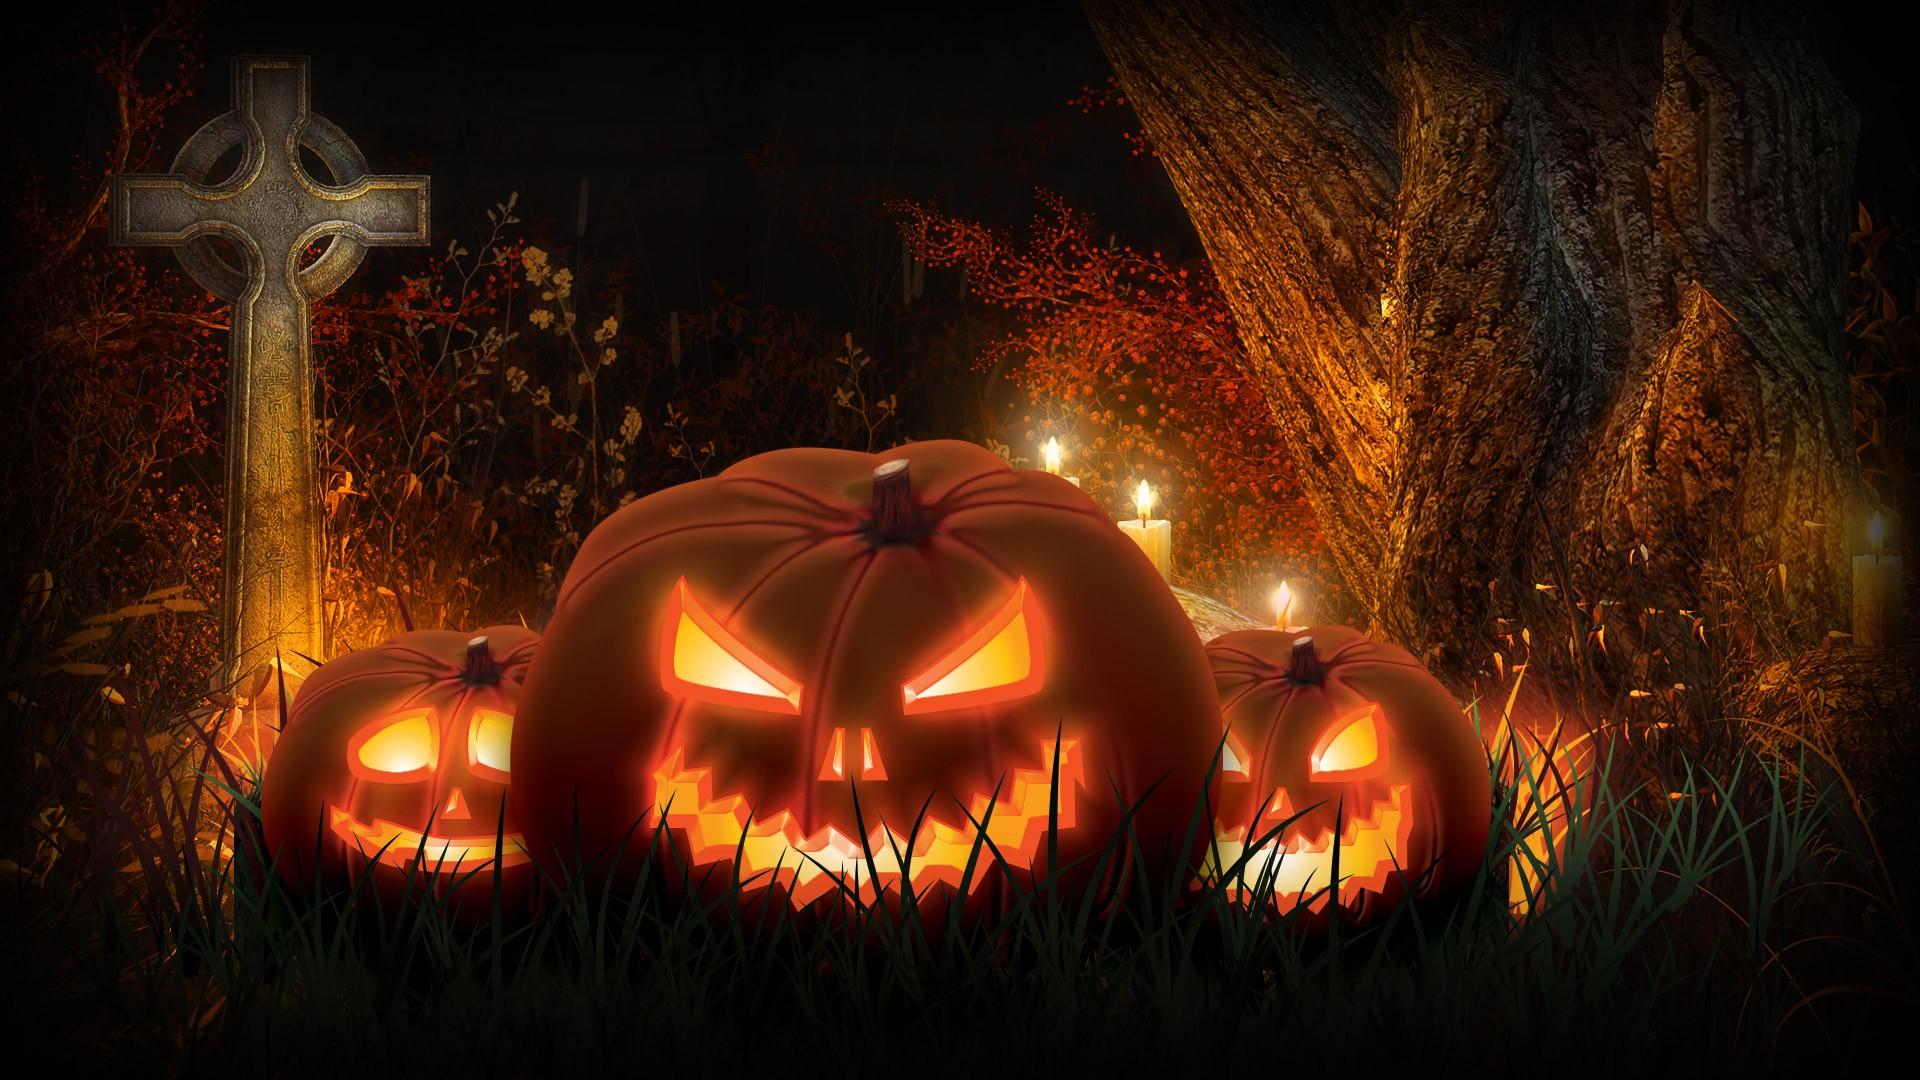 Halloween scary spooky cemetery pumpkins wallpaper - Scary Halloween